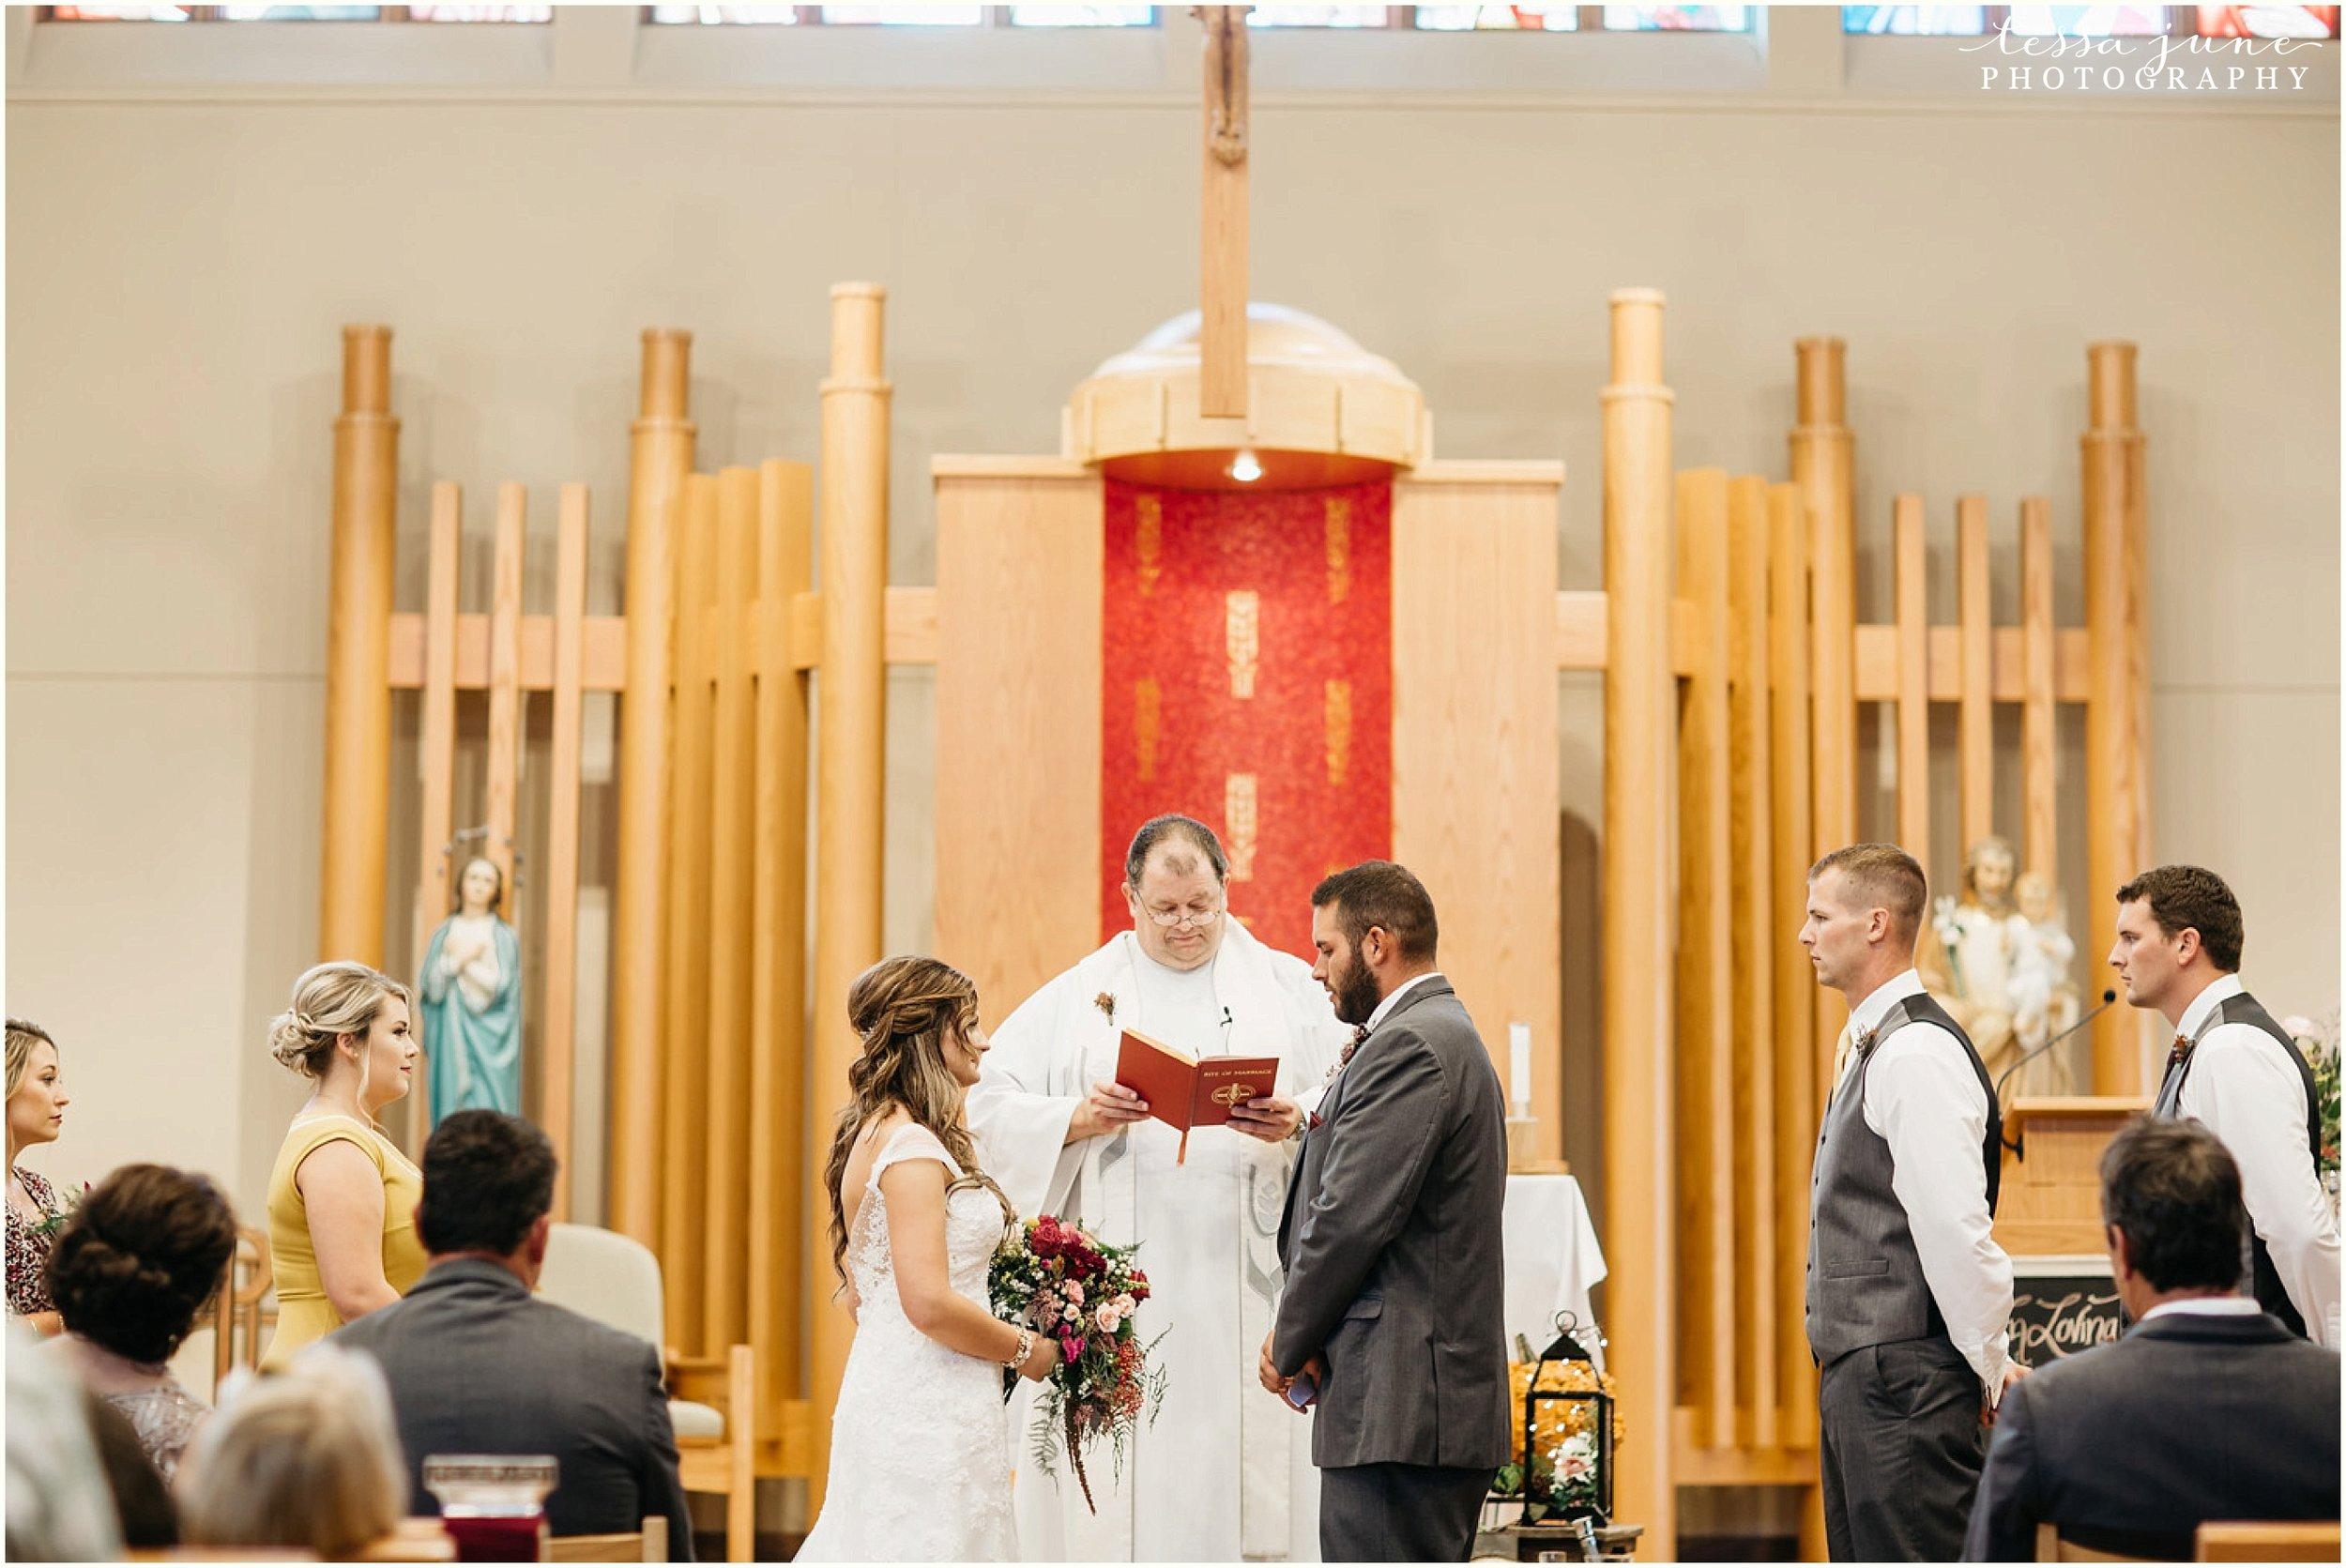 bohemian-minnesota-wedding-mismatched-bridesmaid-dresses-waterfall-st-cloud-tessa-june-photography-111.jpg